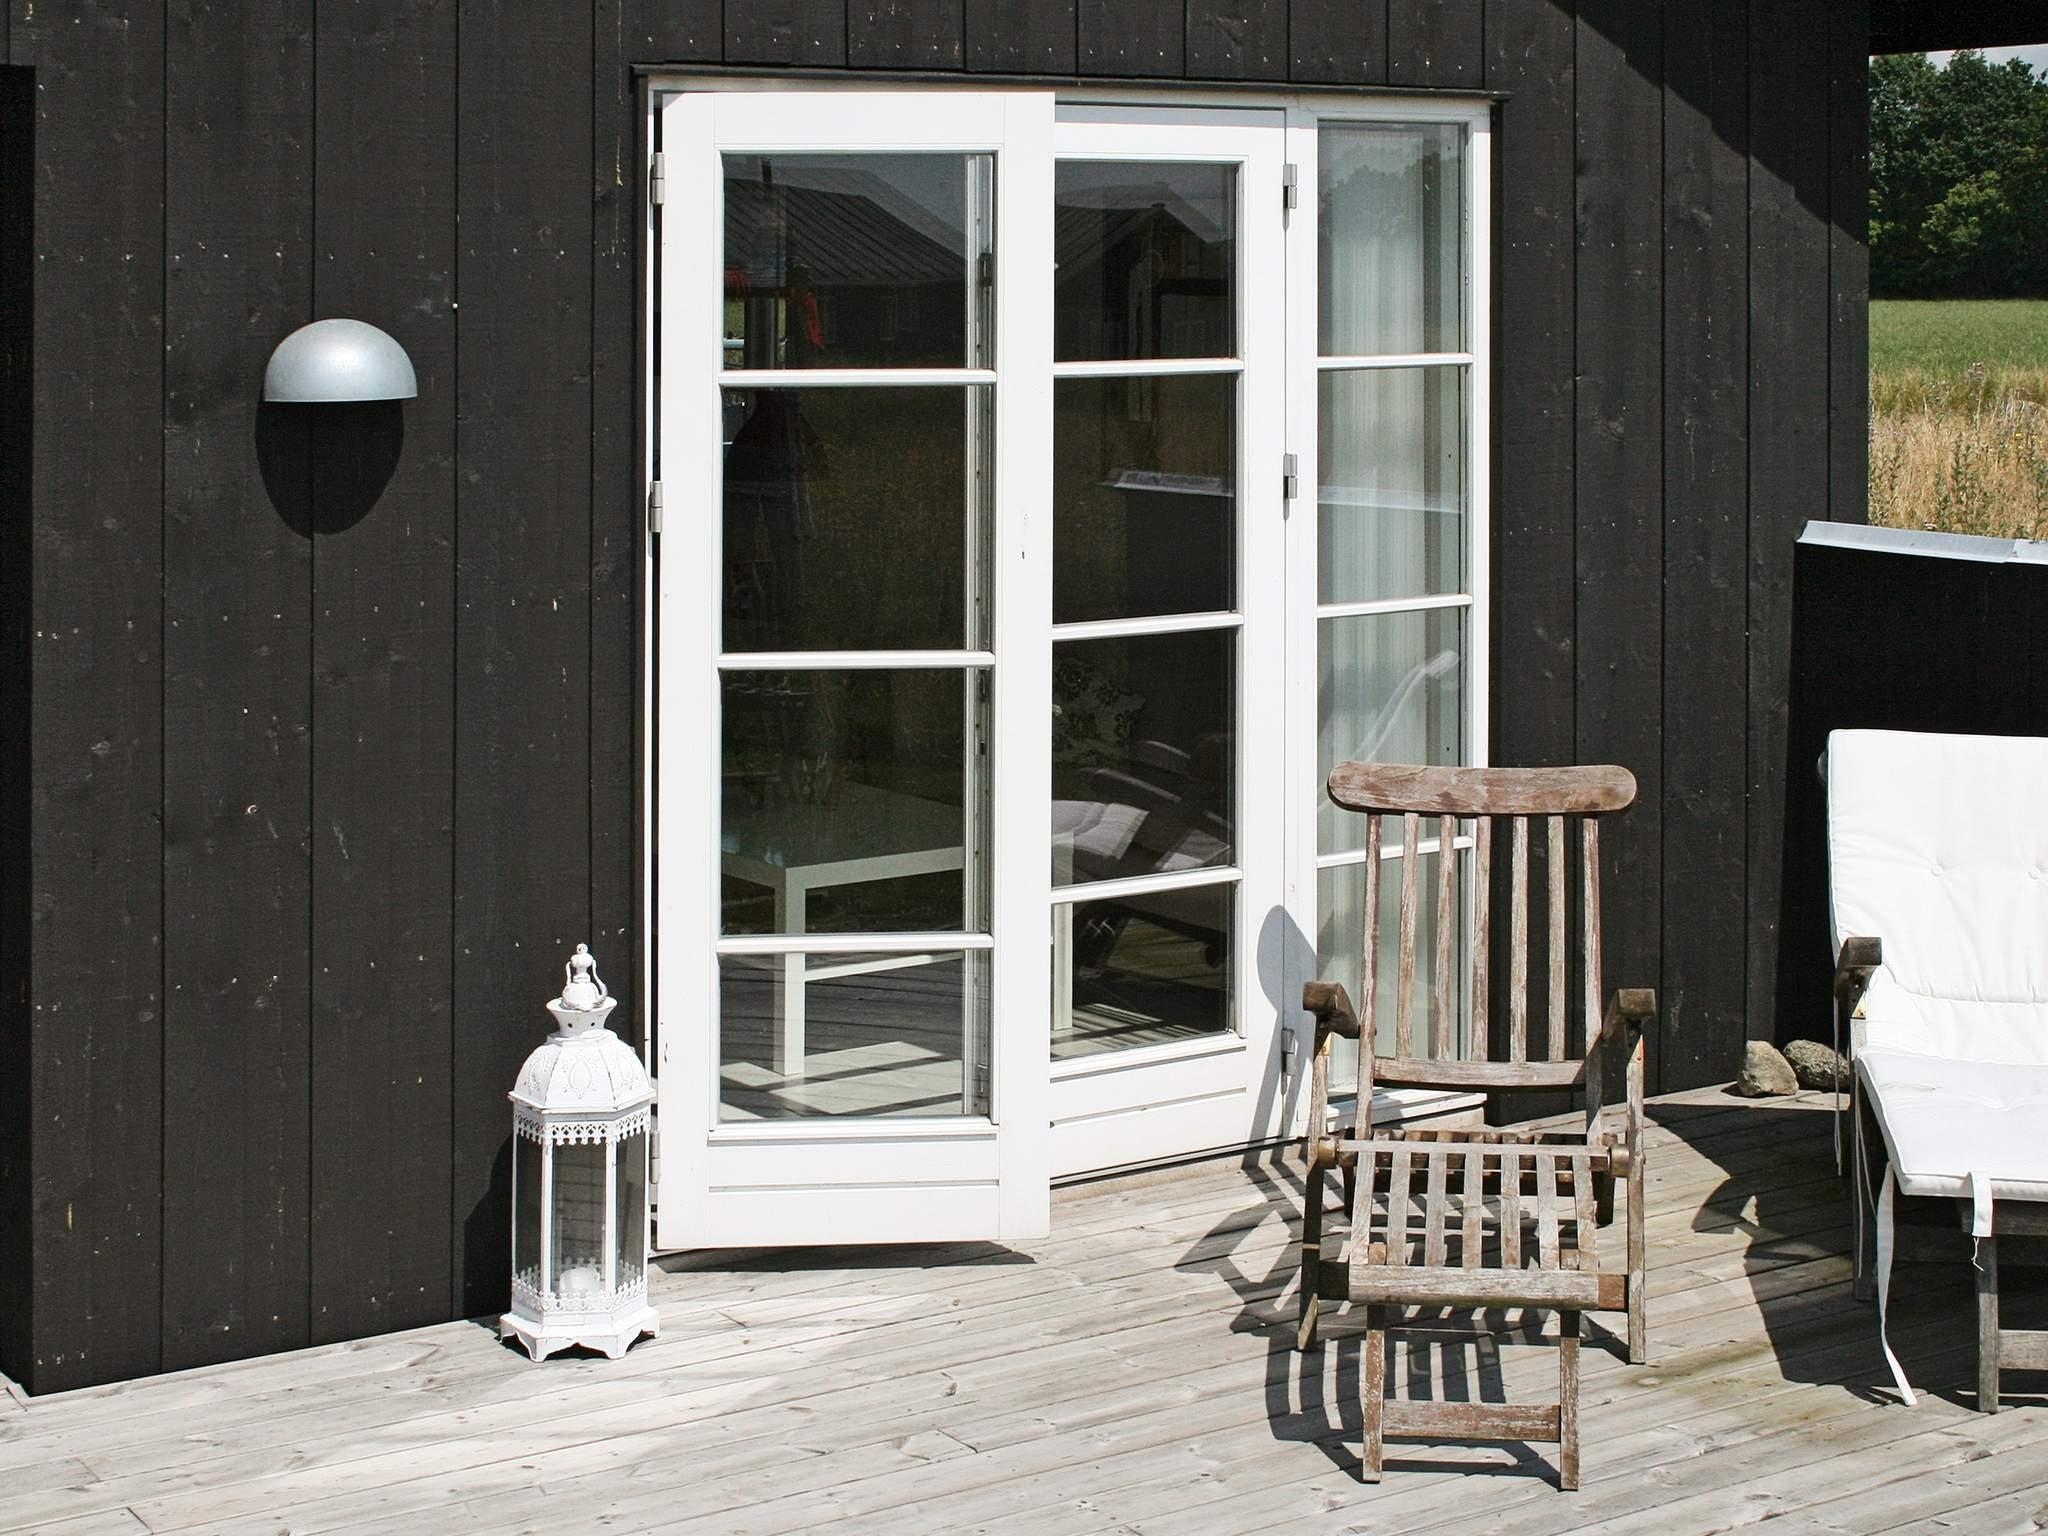 Ferienhaus Nysted (494756), Nysted, , Lolland, Dänemark, Bild 18